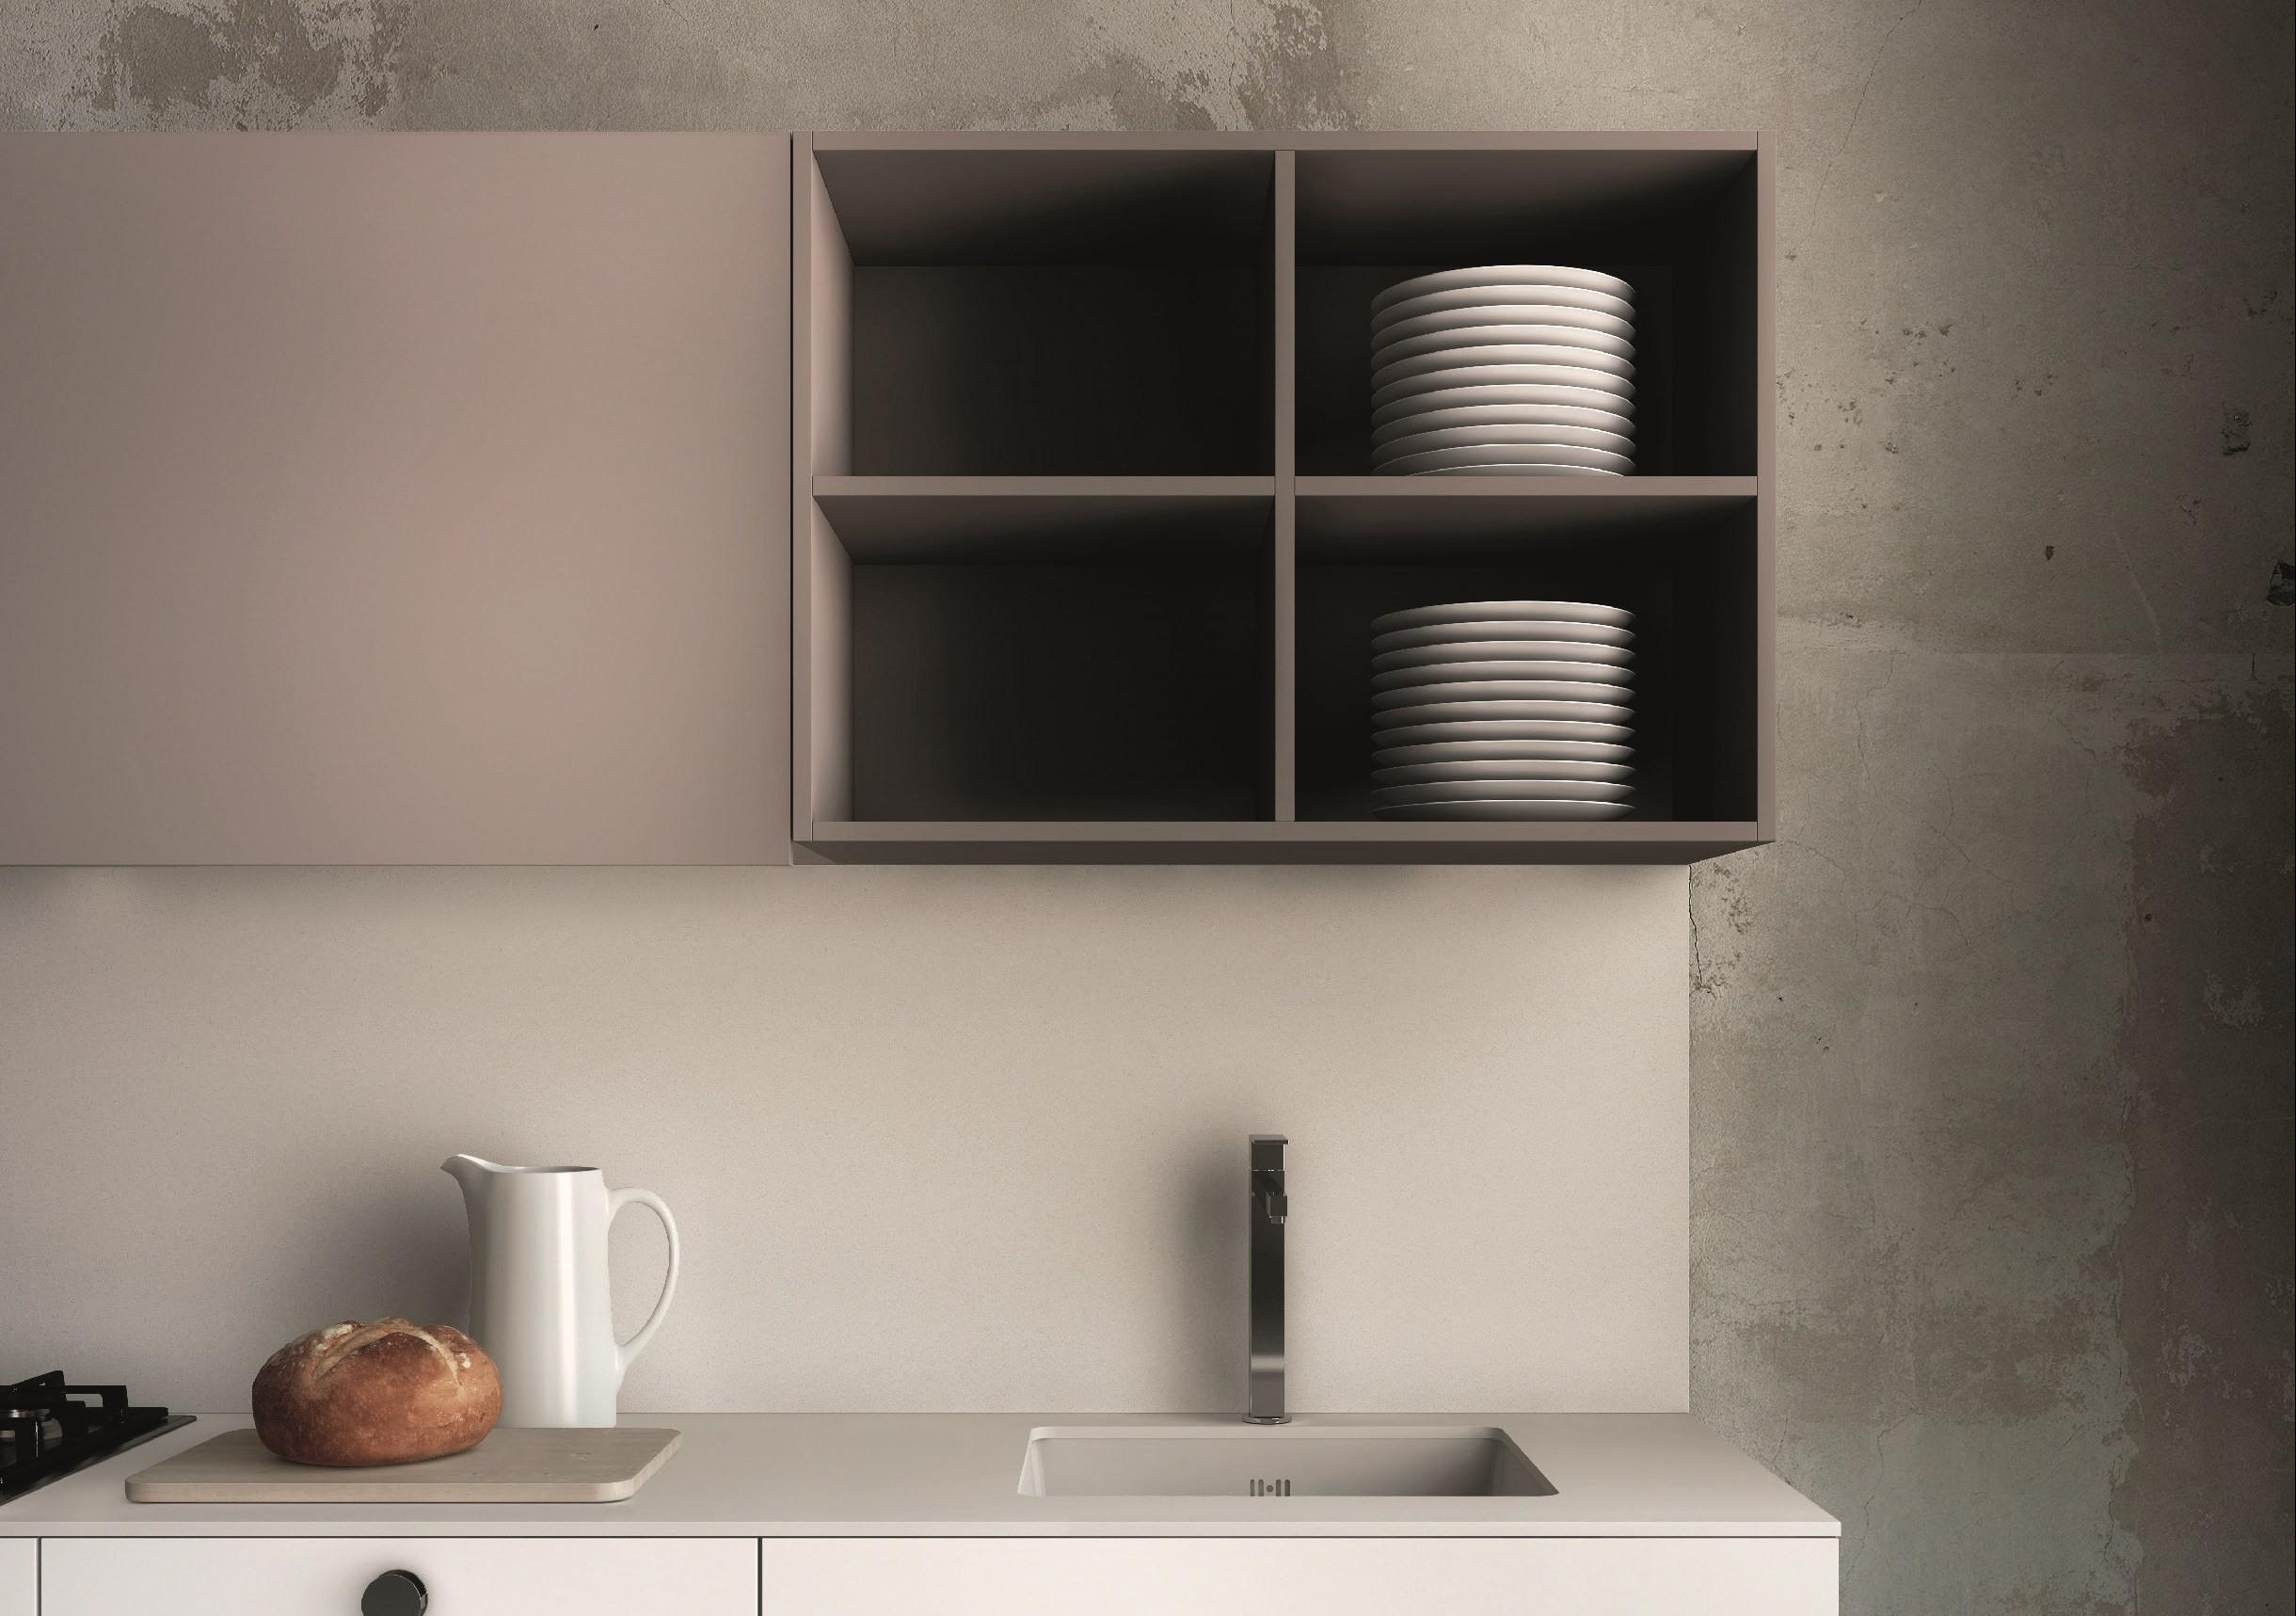 Del tongo milano mobili gala - Cucine del tongo catalogo ...